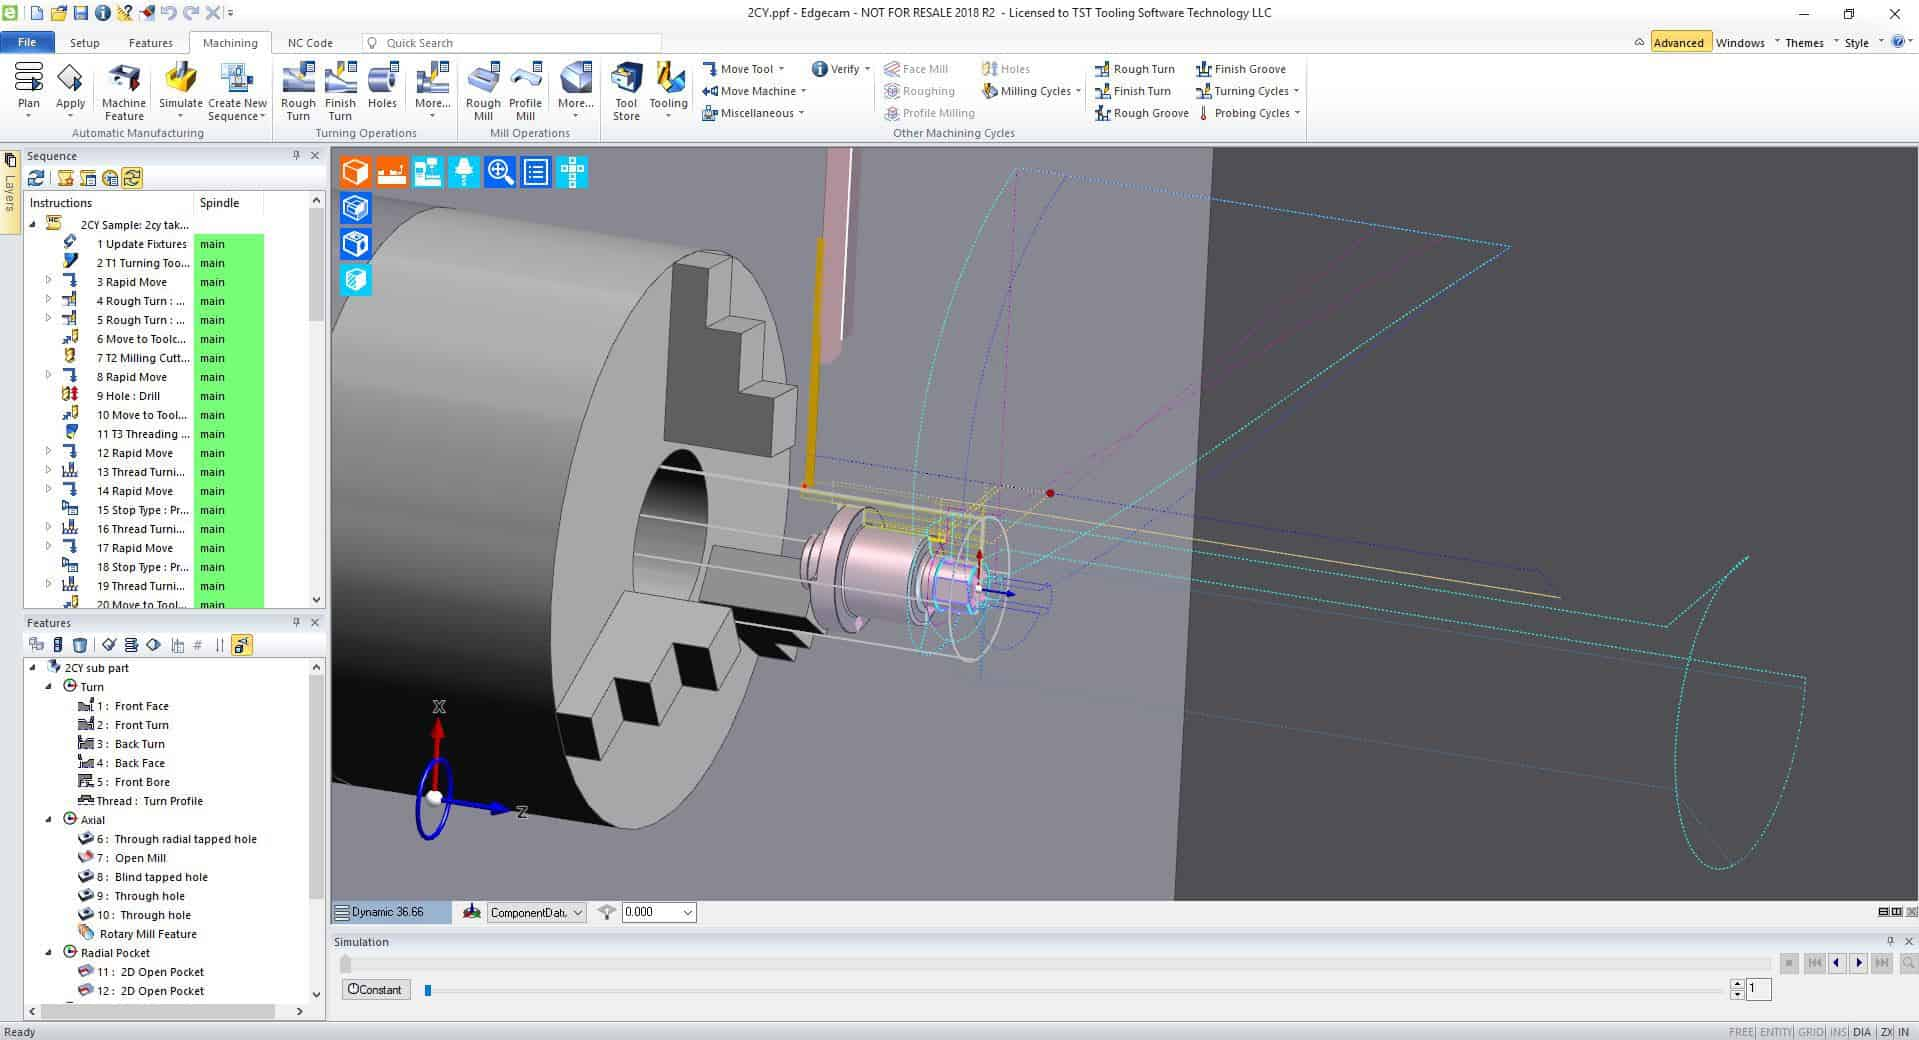 Edgecam-Lathe - TST Tooling Software Technology, LLC